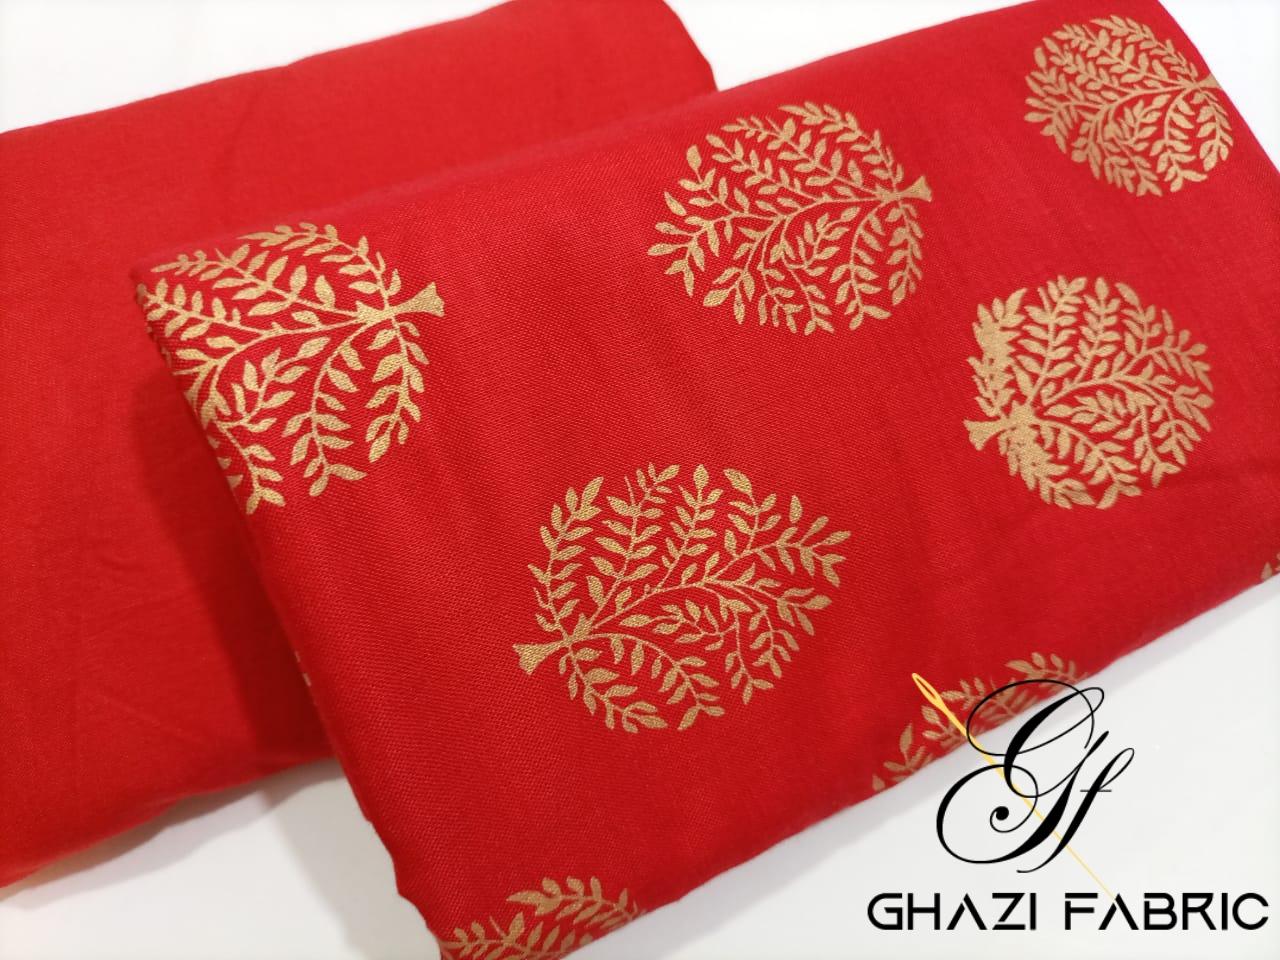 Ghazi Fabric Linen Collection unstich 2 piece with Gold print  premium quality trendy elegant superb Article linen unstich shirt & trouser 5.50/ yards